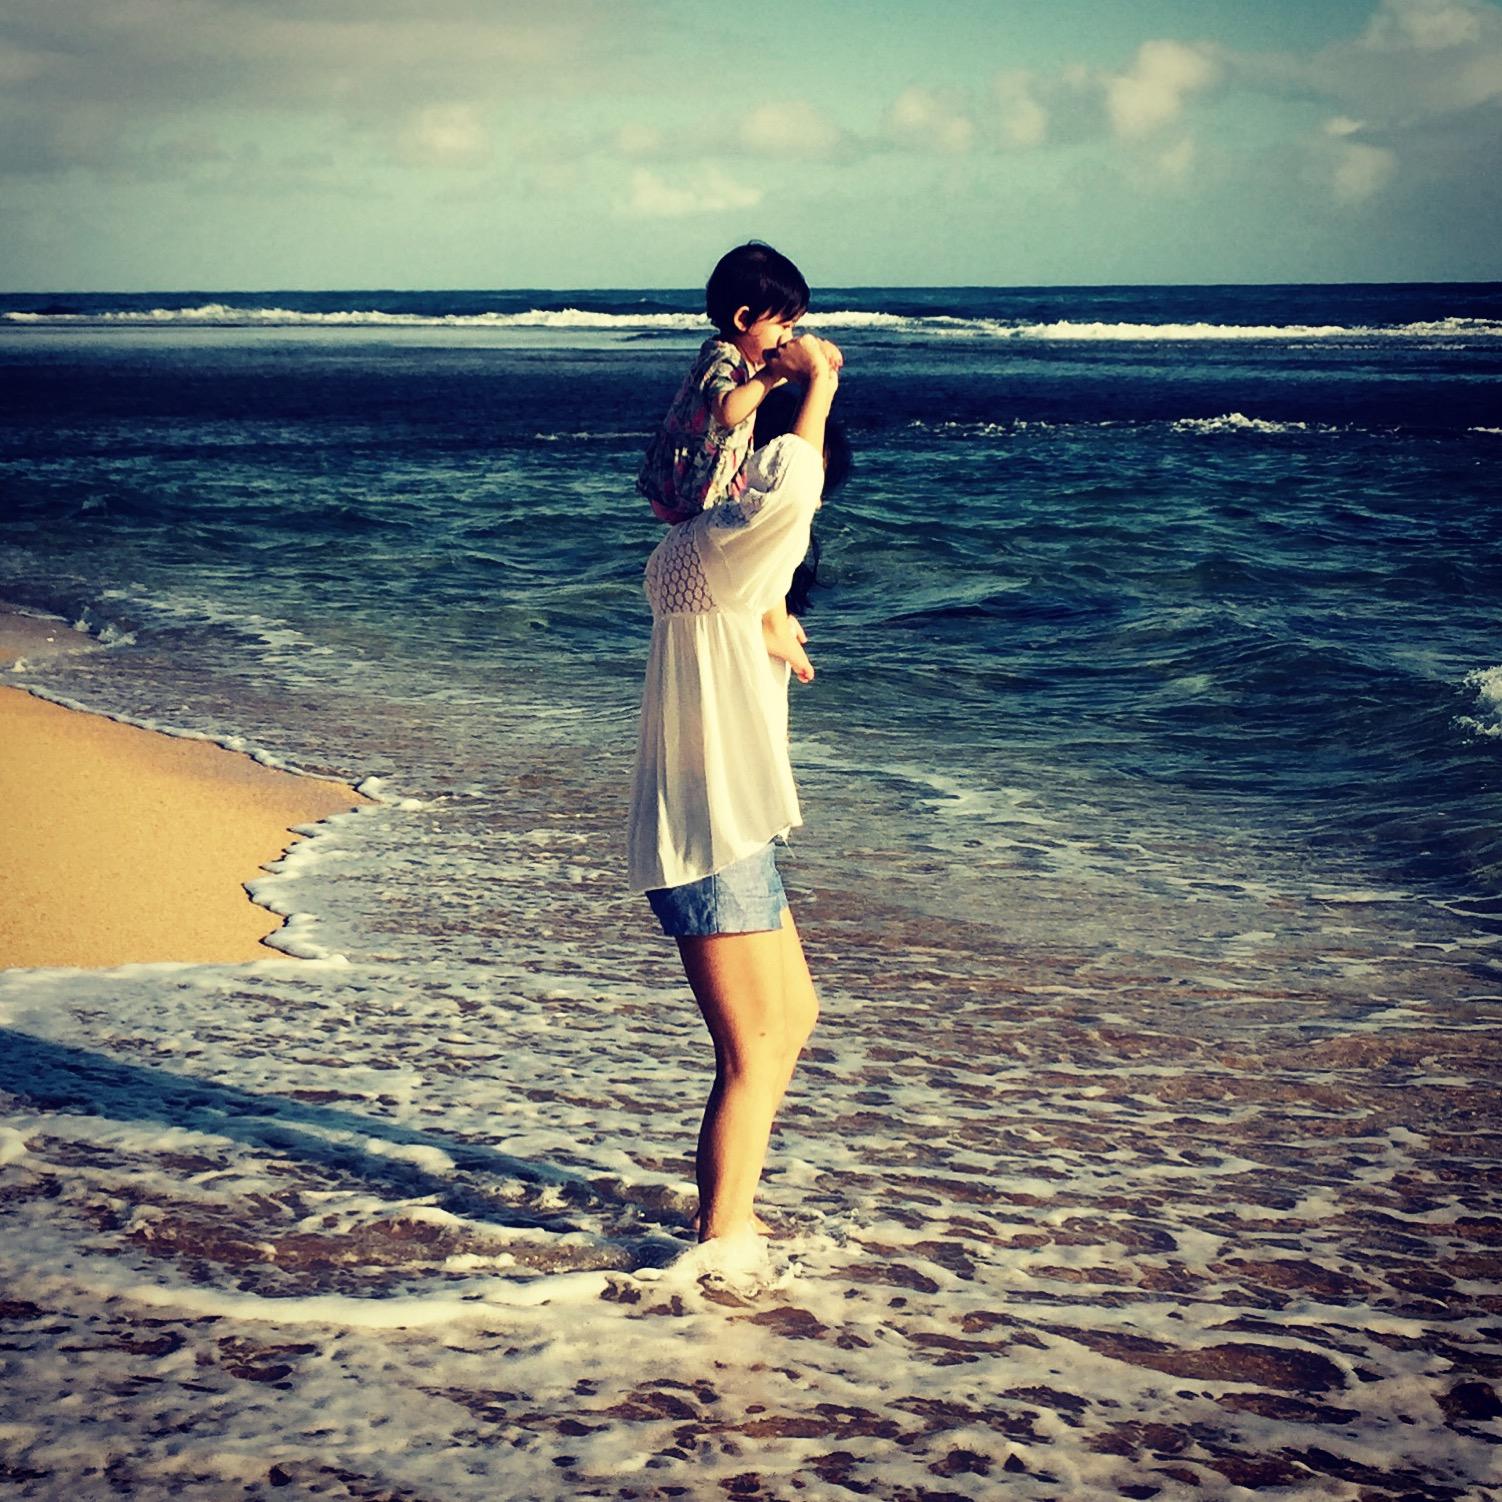 VEGASMAMA & me beachtime.